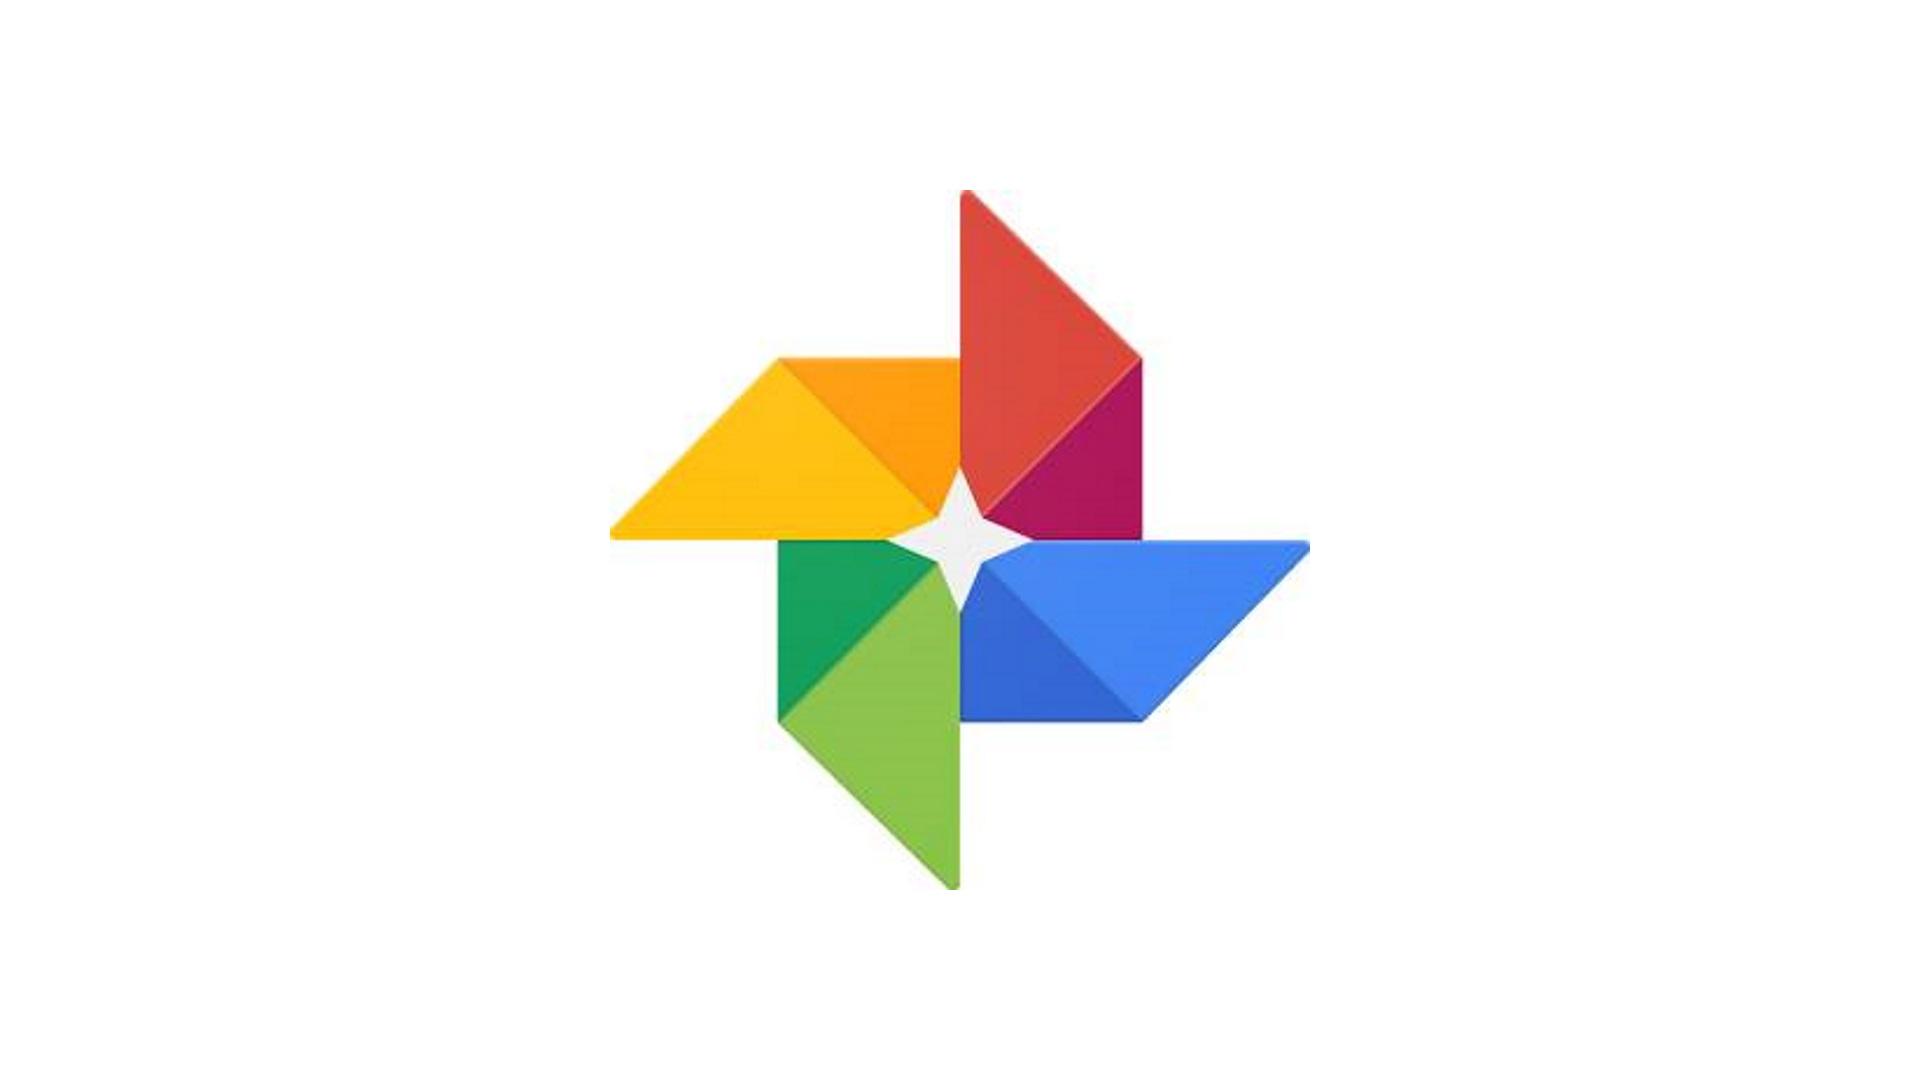 Android版「Google フォト」v3.5で動画のキャッシュ保存をサポート